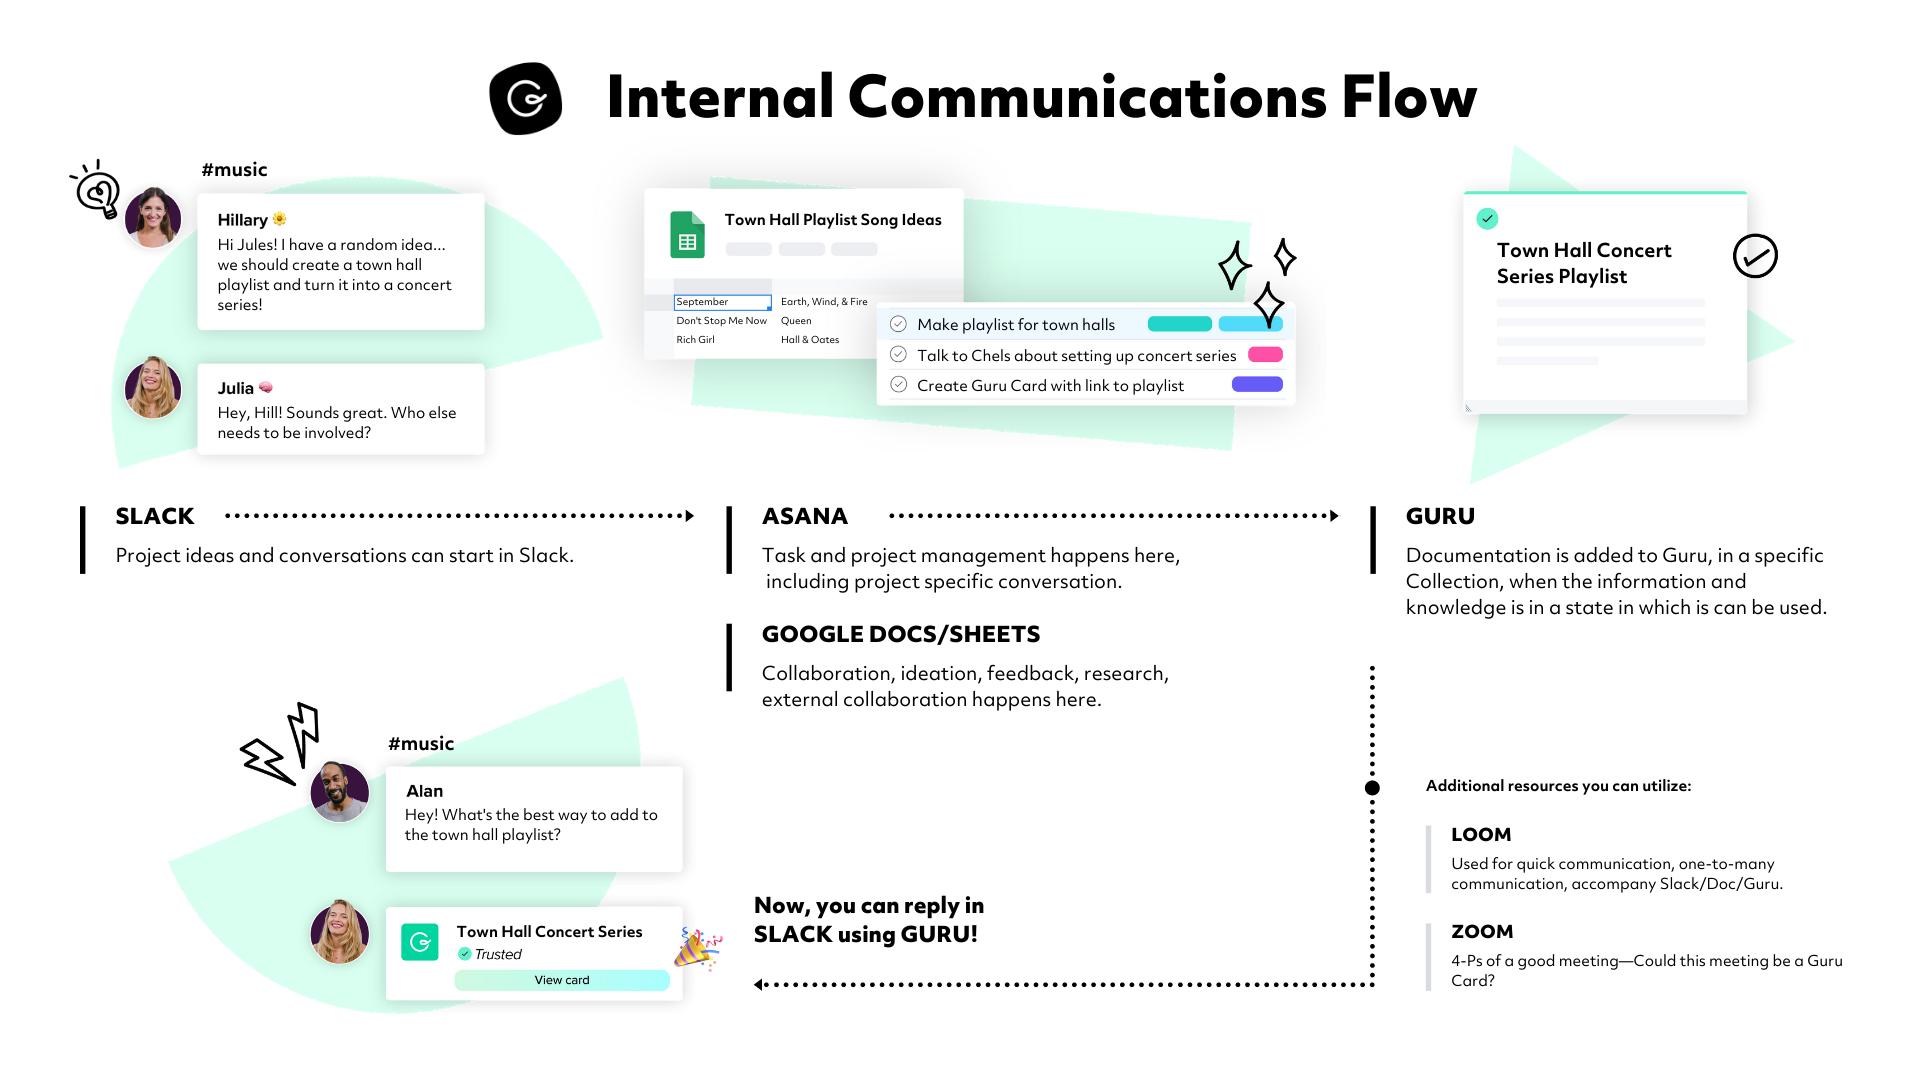 Internal Communications Flow